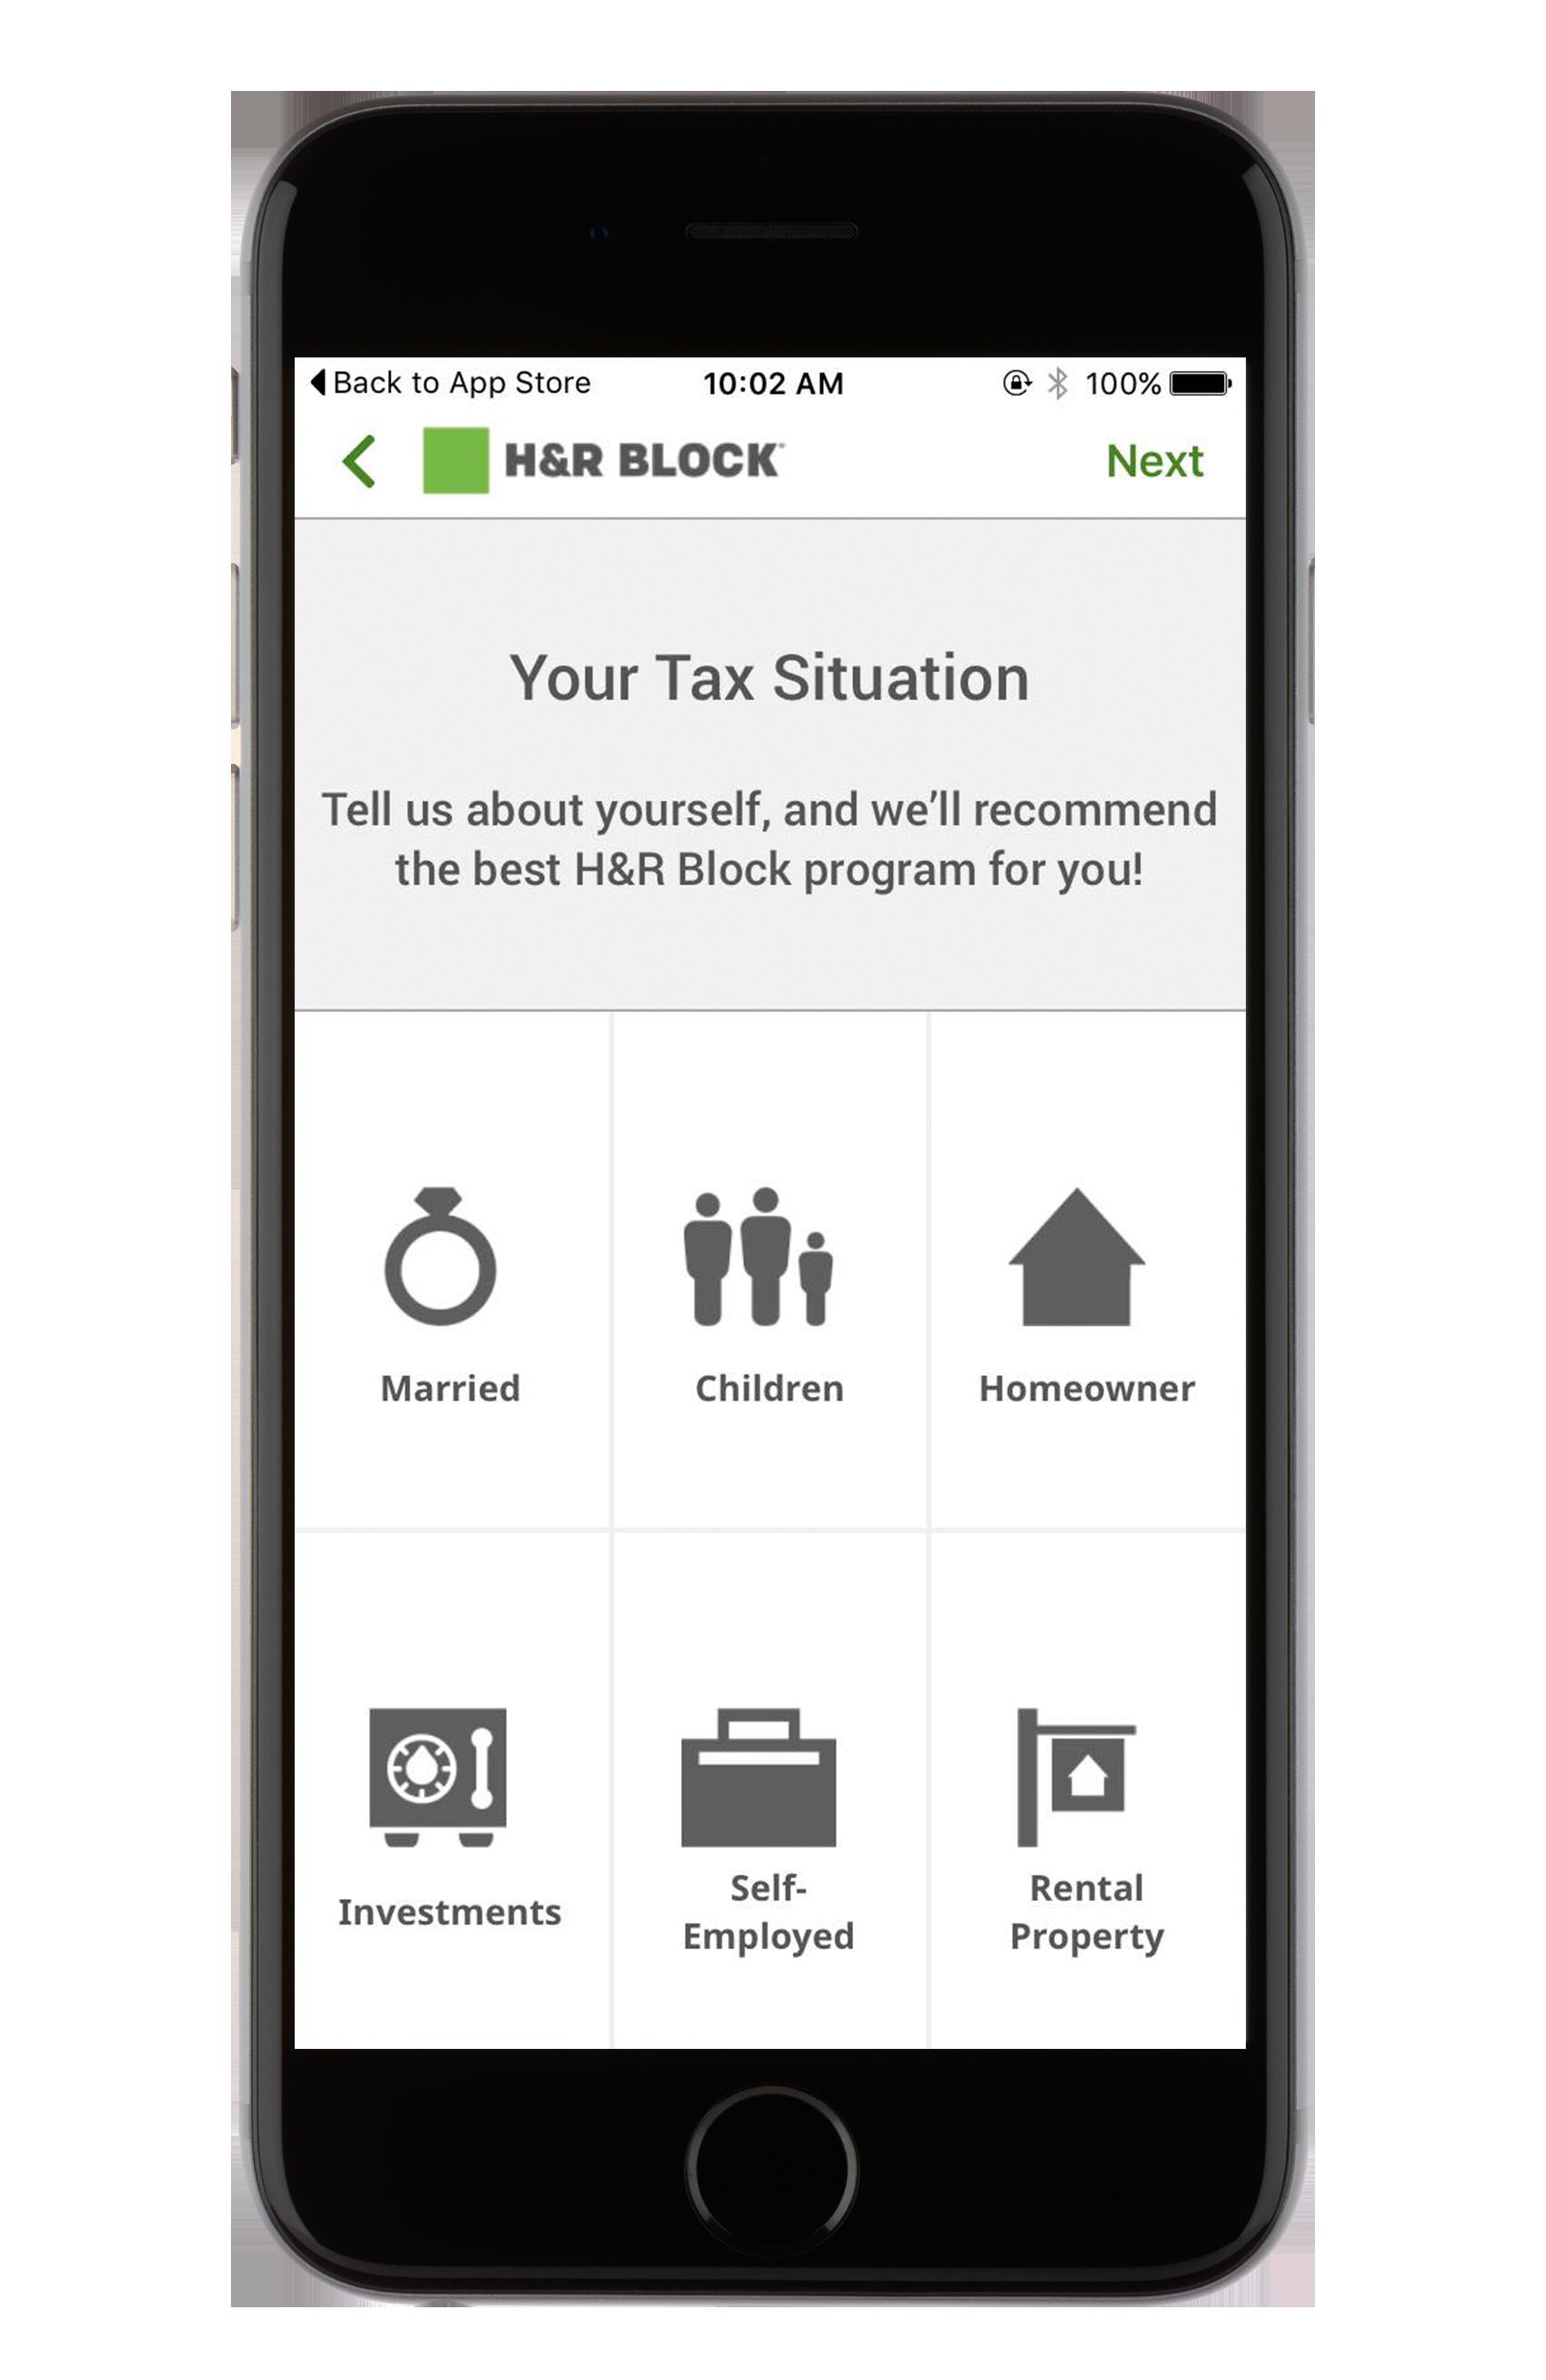 H&R Block estimates its clients